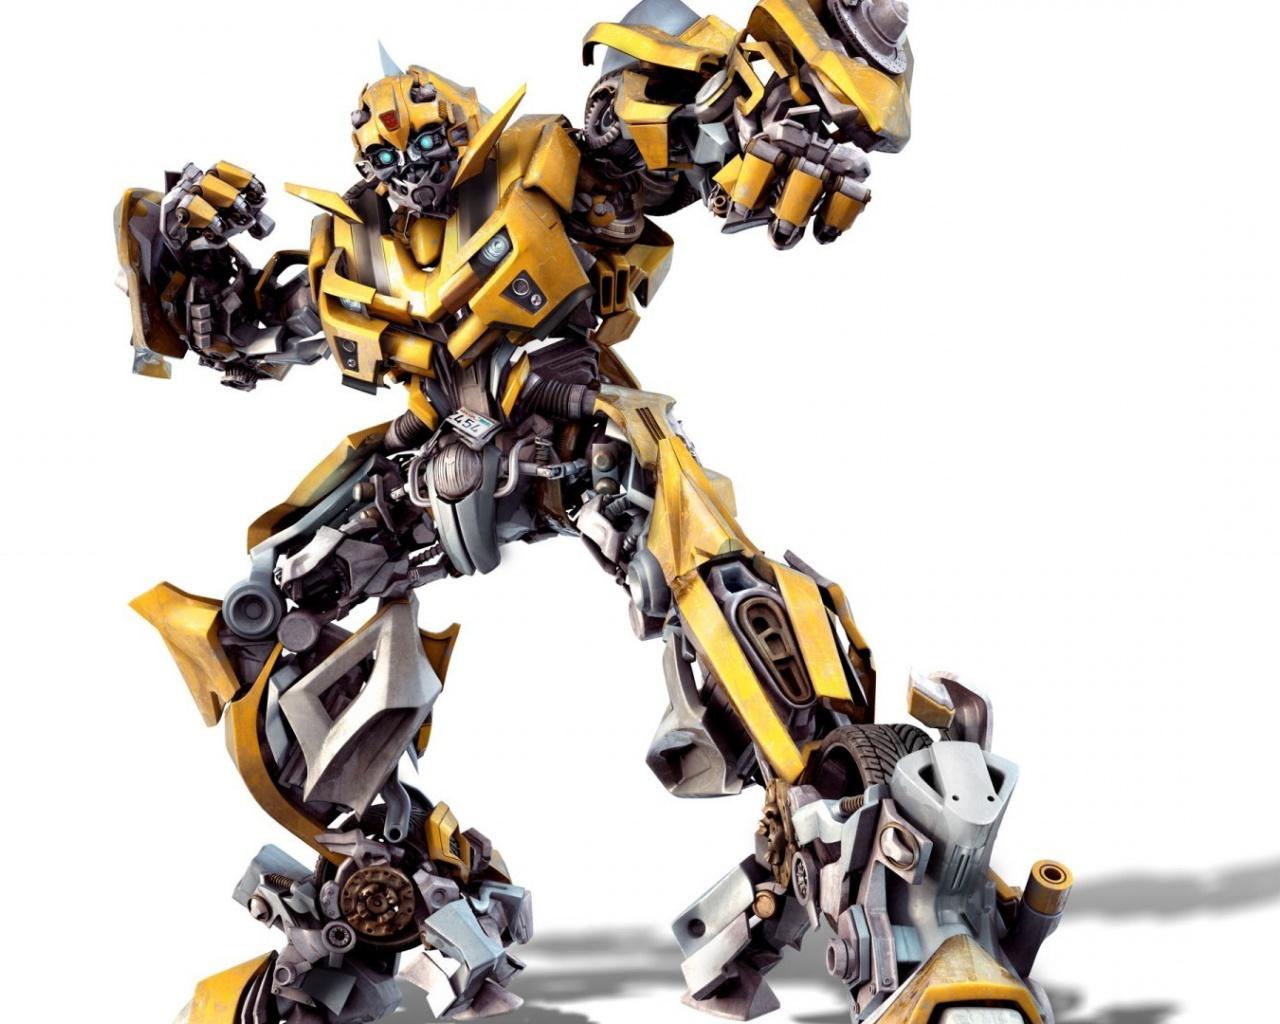 1280x1024 Transformers Bumblebee Artwork desktop PC and Mac wallpaper 1280x1024